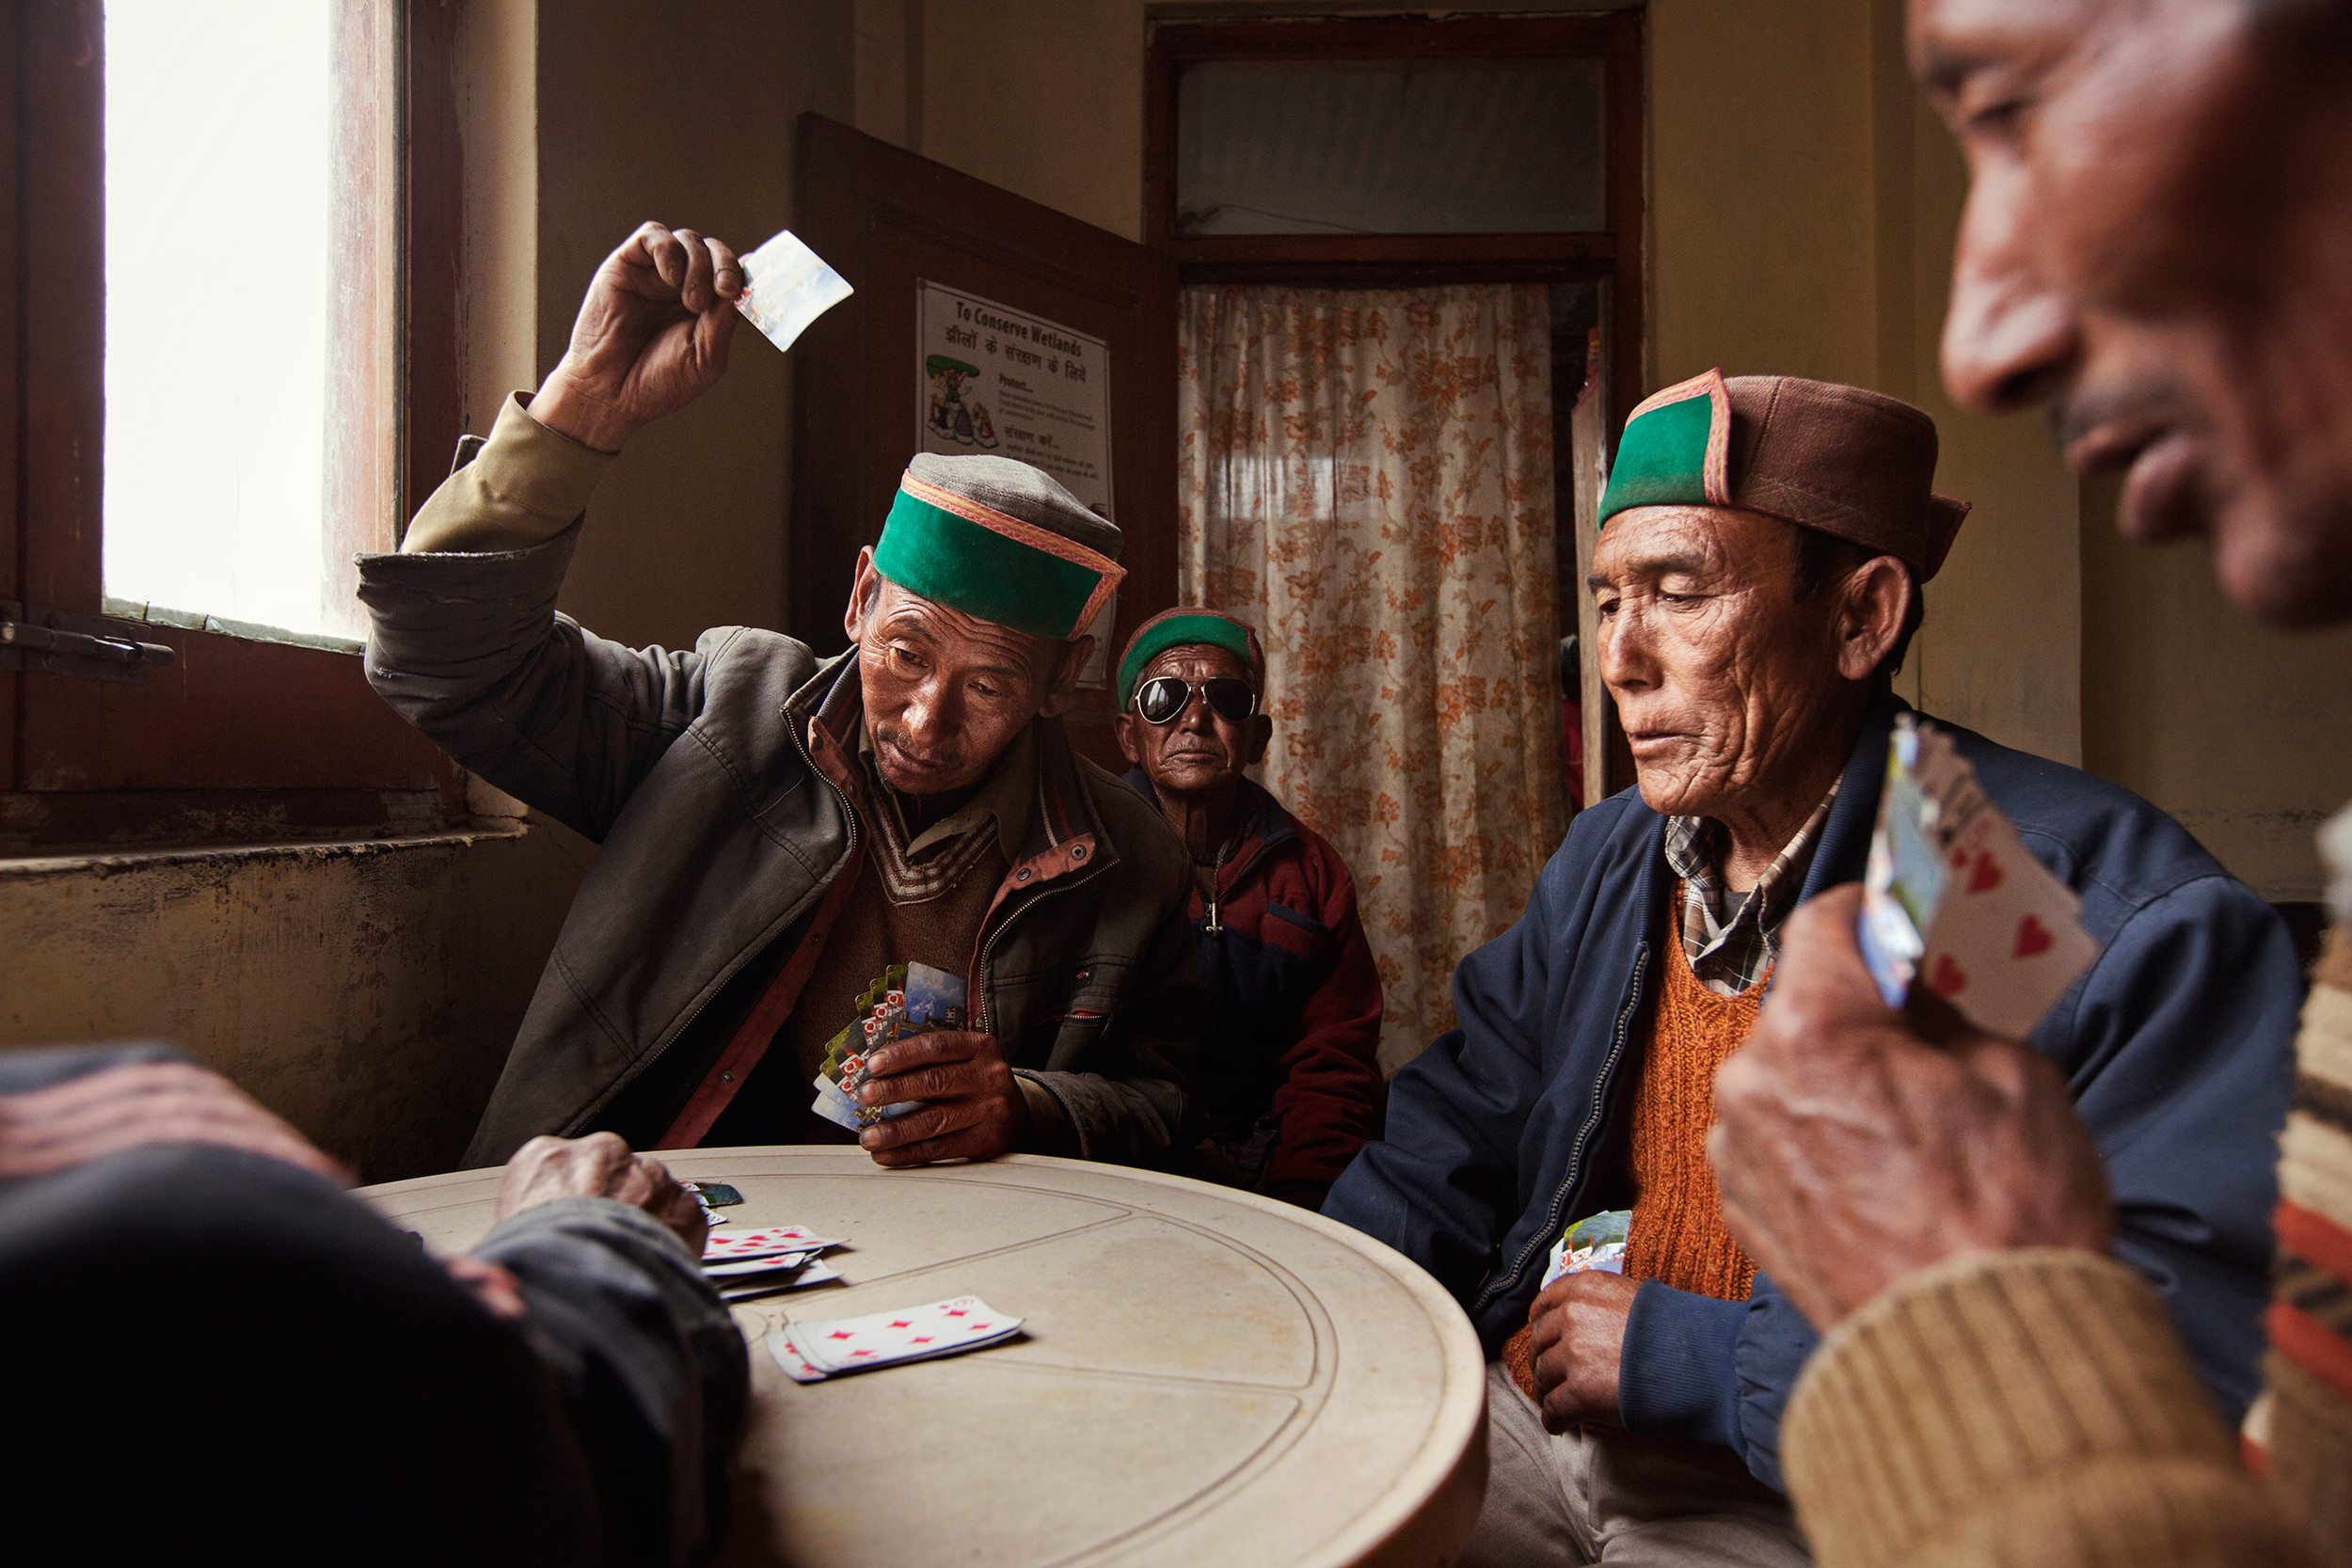 Nako, Himachal Pradesh, India - 2011 | Canon EOS 5D MKIII 16-35mm@23mm,f/5.0, ISO 800, 1/200s